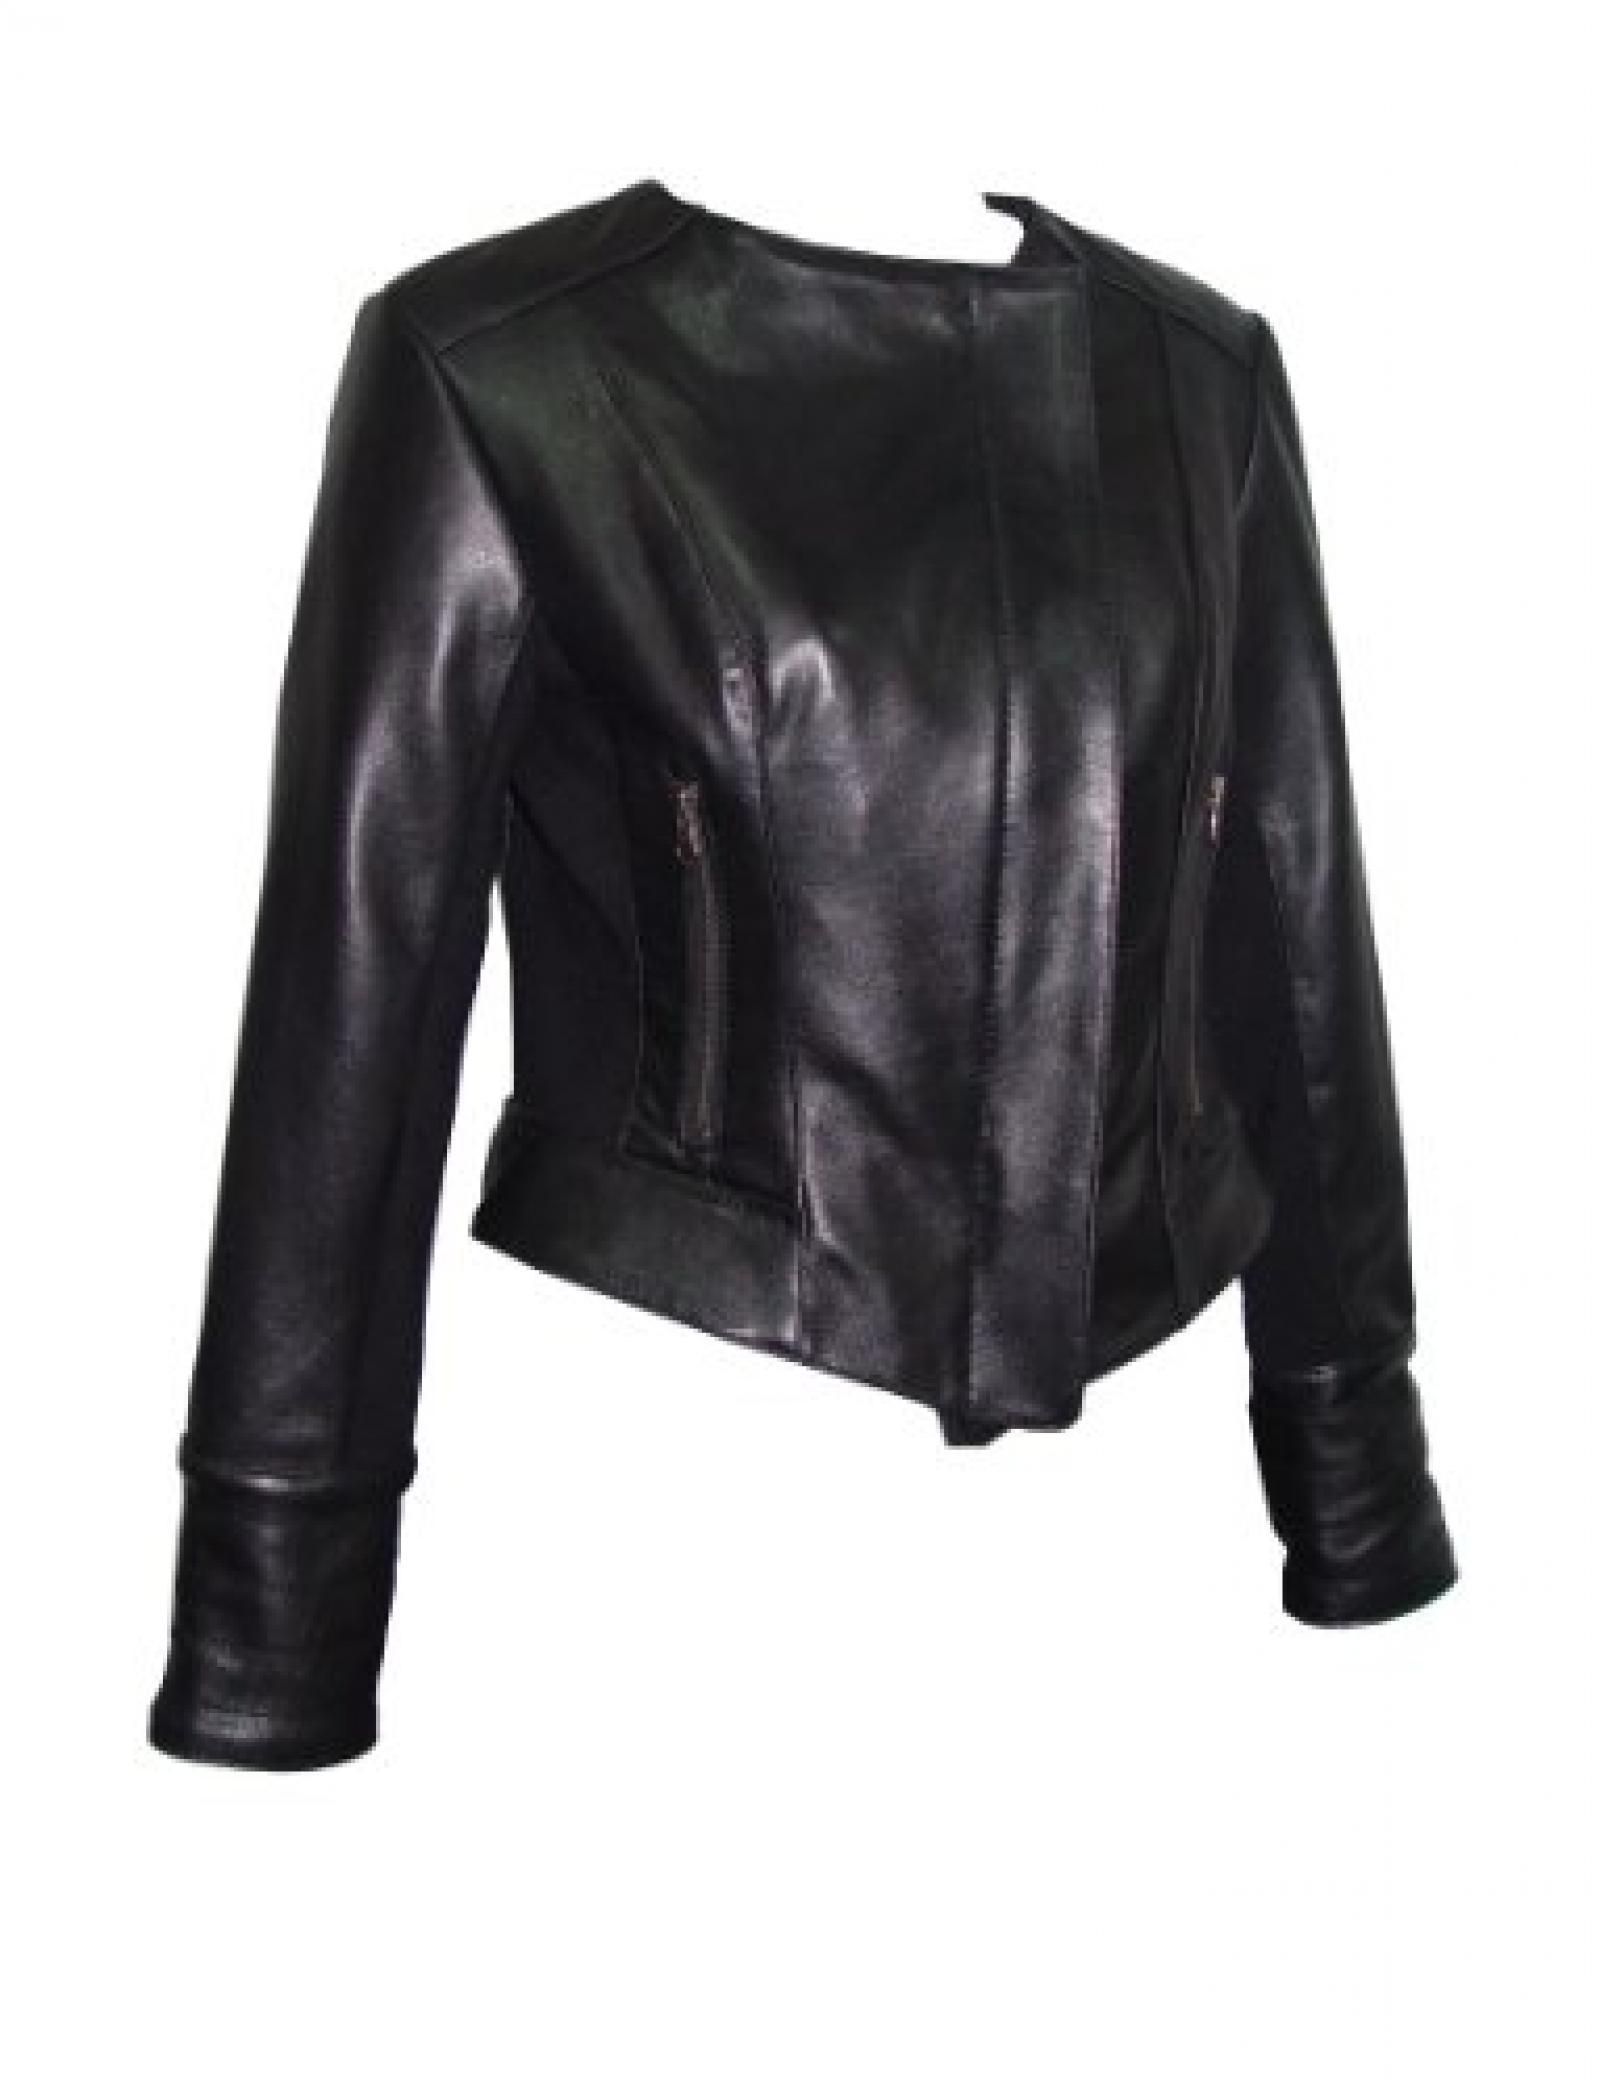 Nettailor FREE tailoring Women PETITE SZ 4070 Leather Moto Jacket Collarless